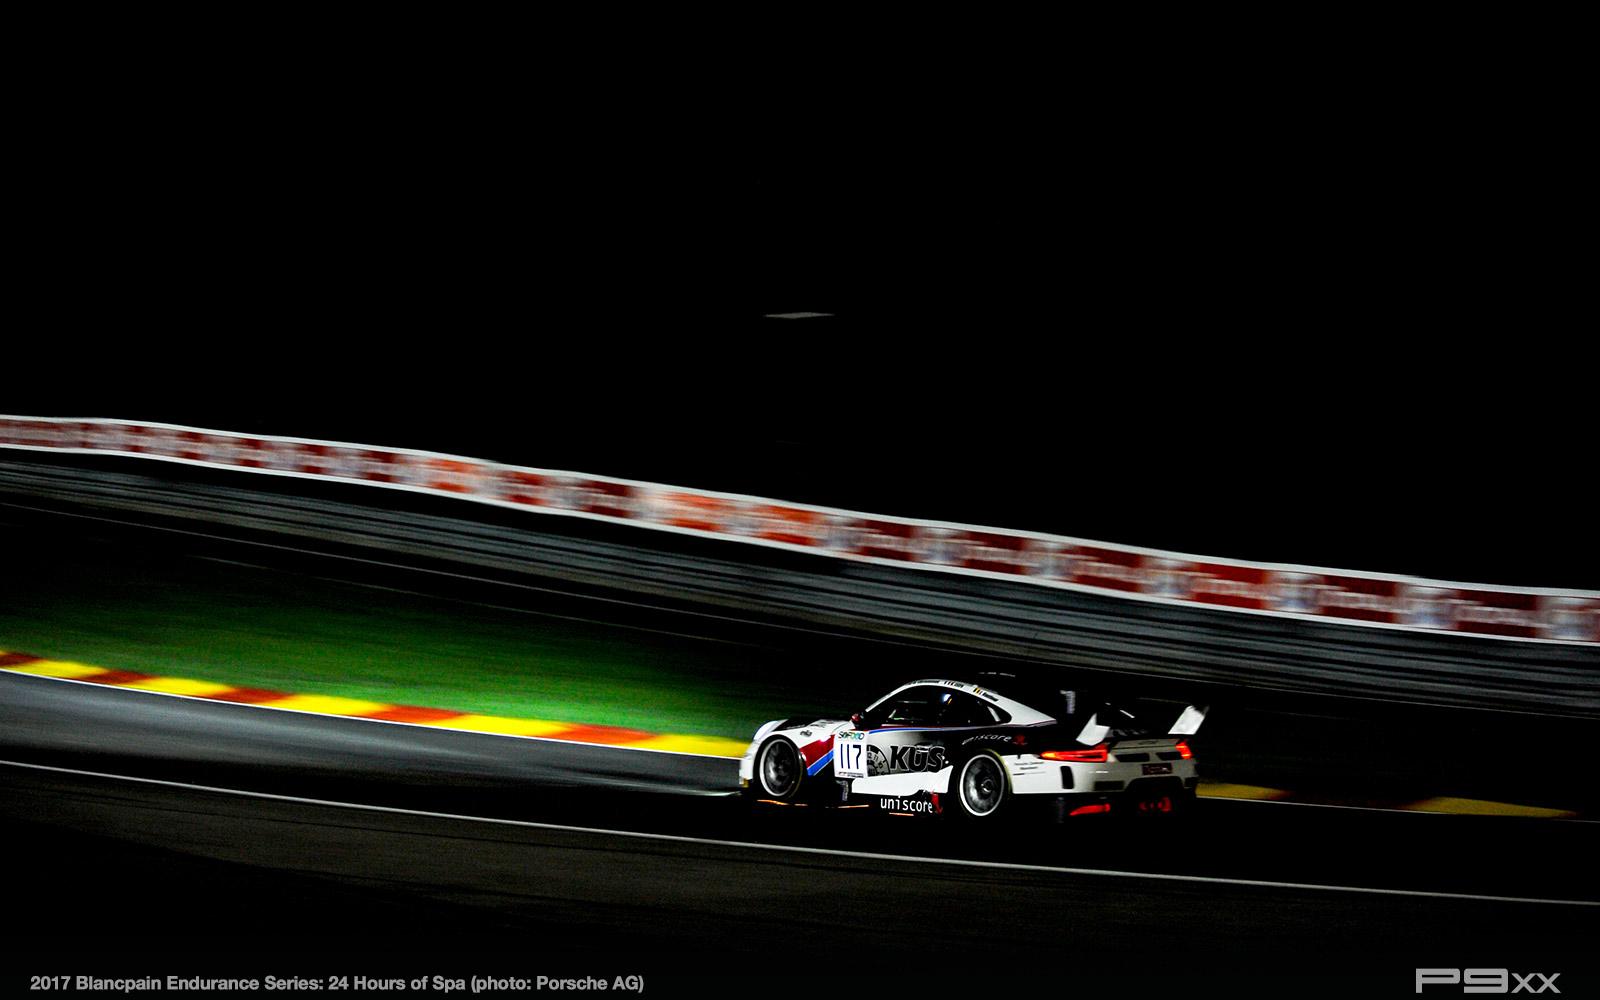 2017-24-Hours-of-Spa-Porsche-330